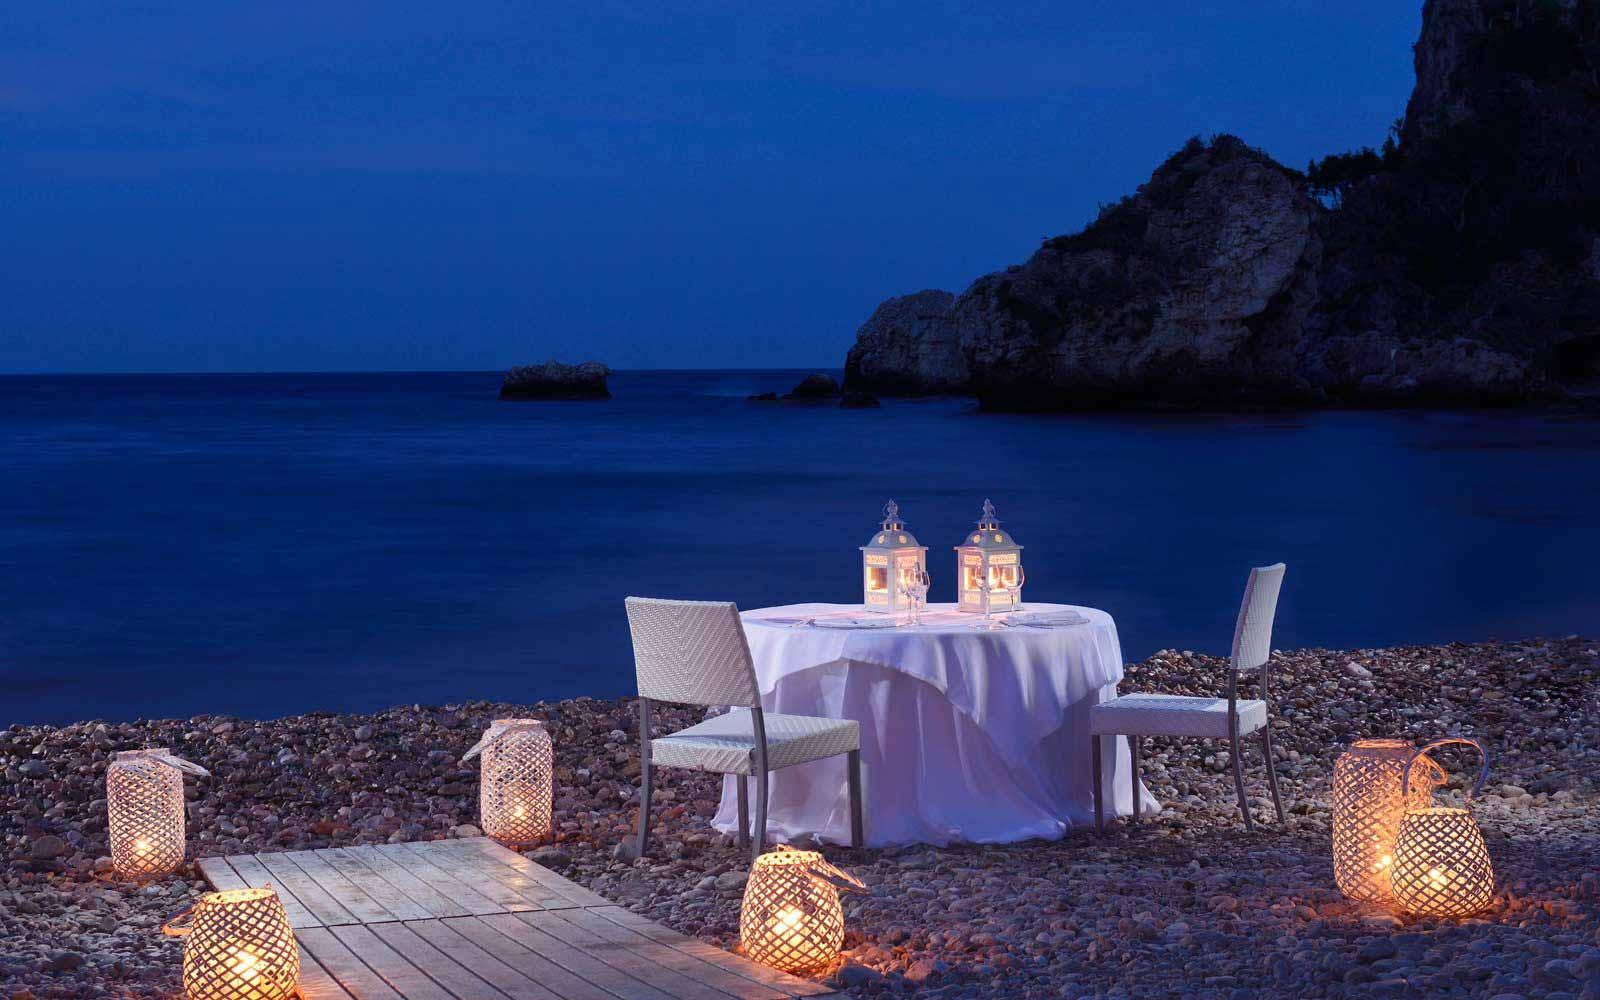 Romantic dinner on the beach at La Plage Resort